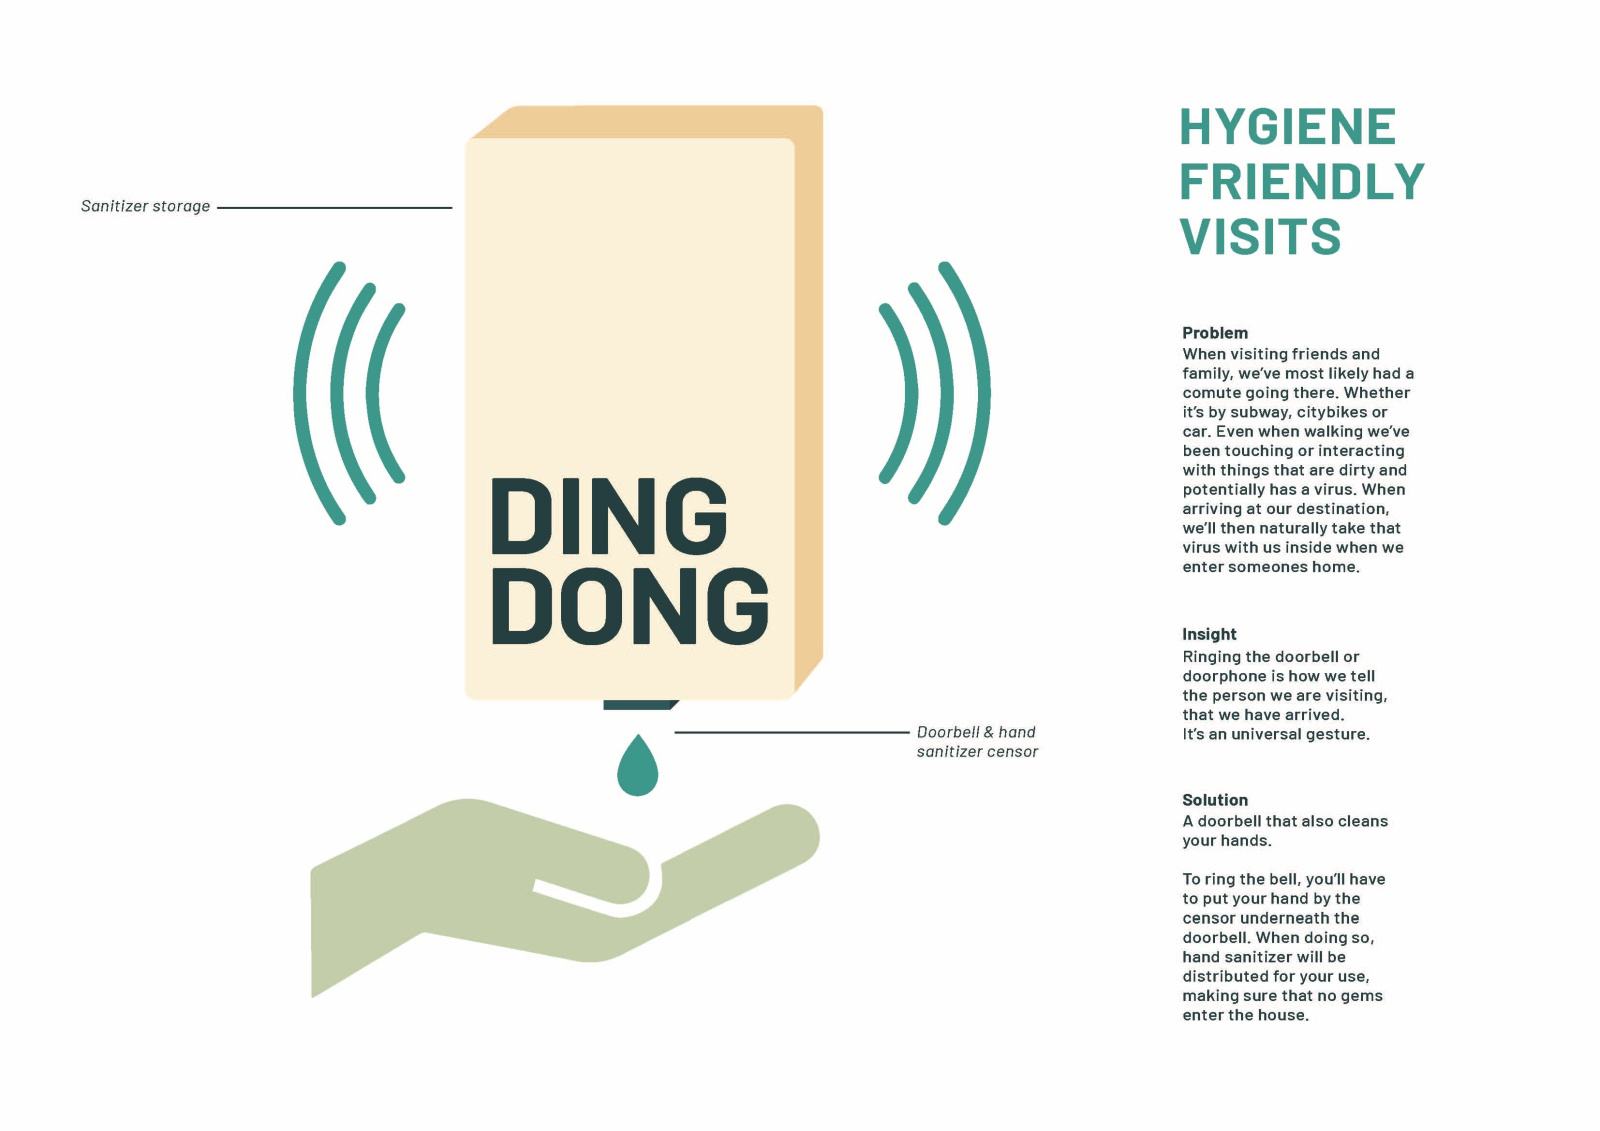 Fountain of Hygiene